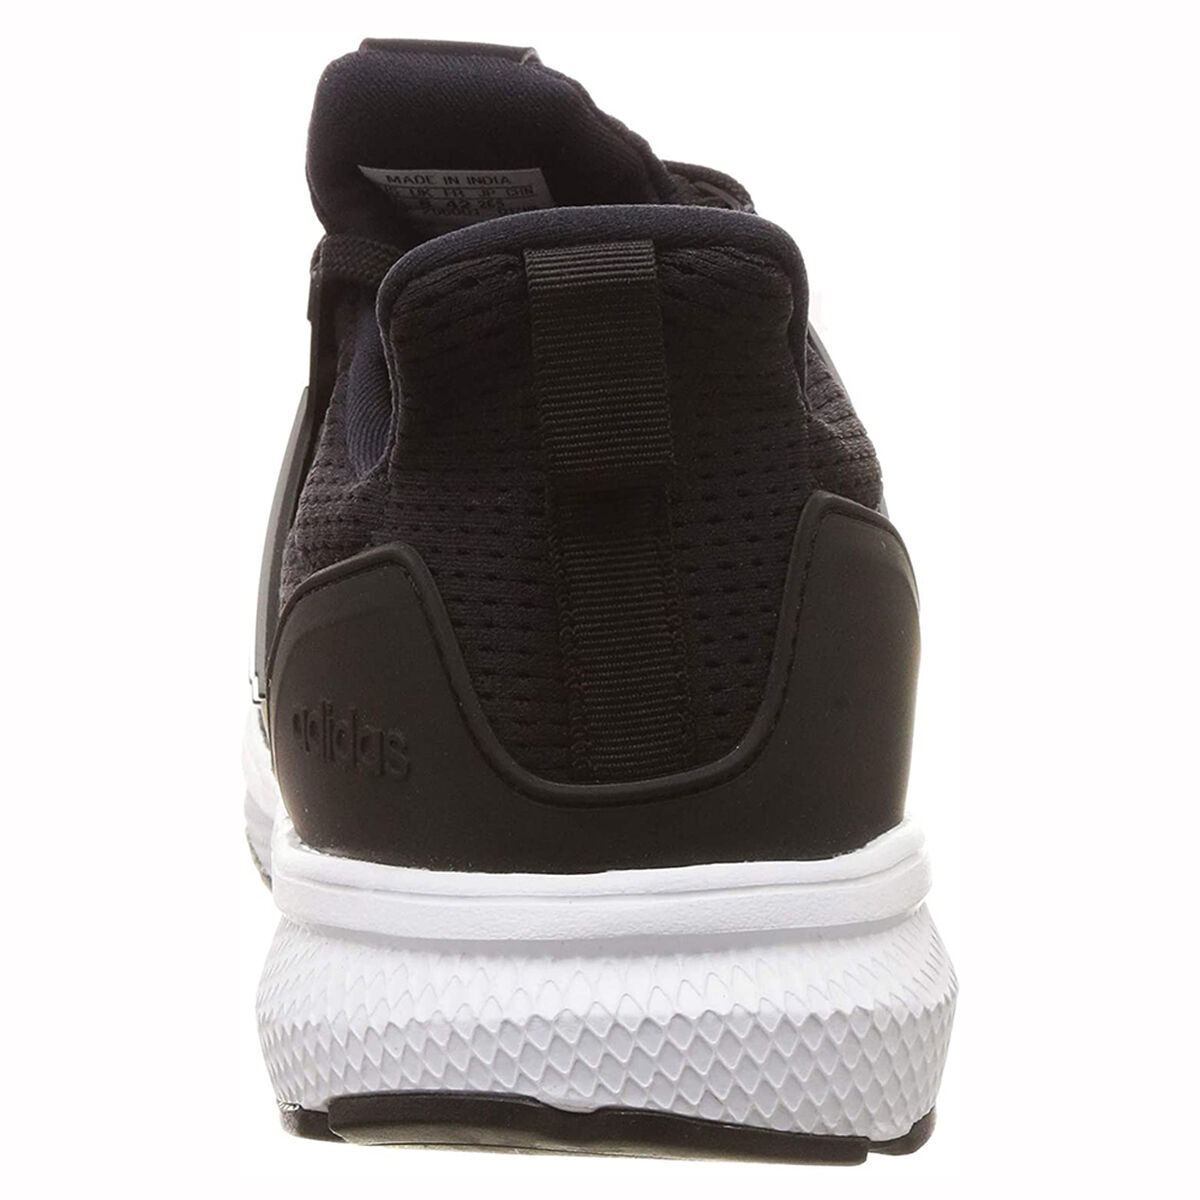 Zapatilla Hombre Adidas Jerzo M